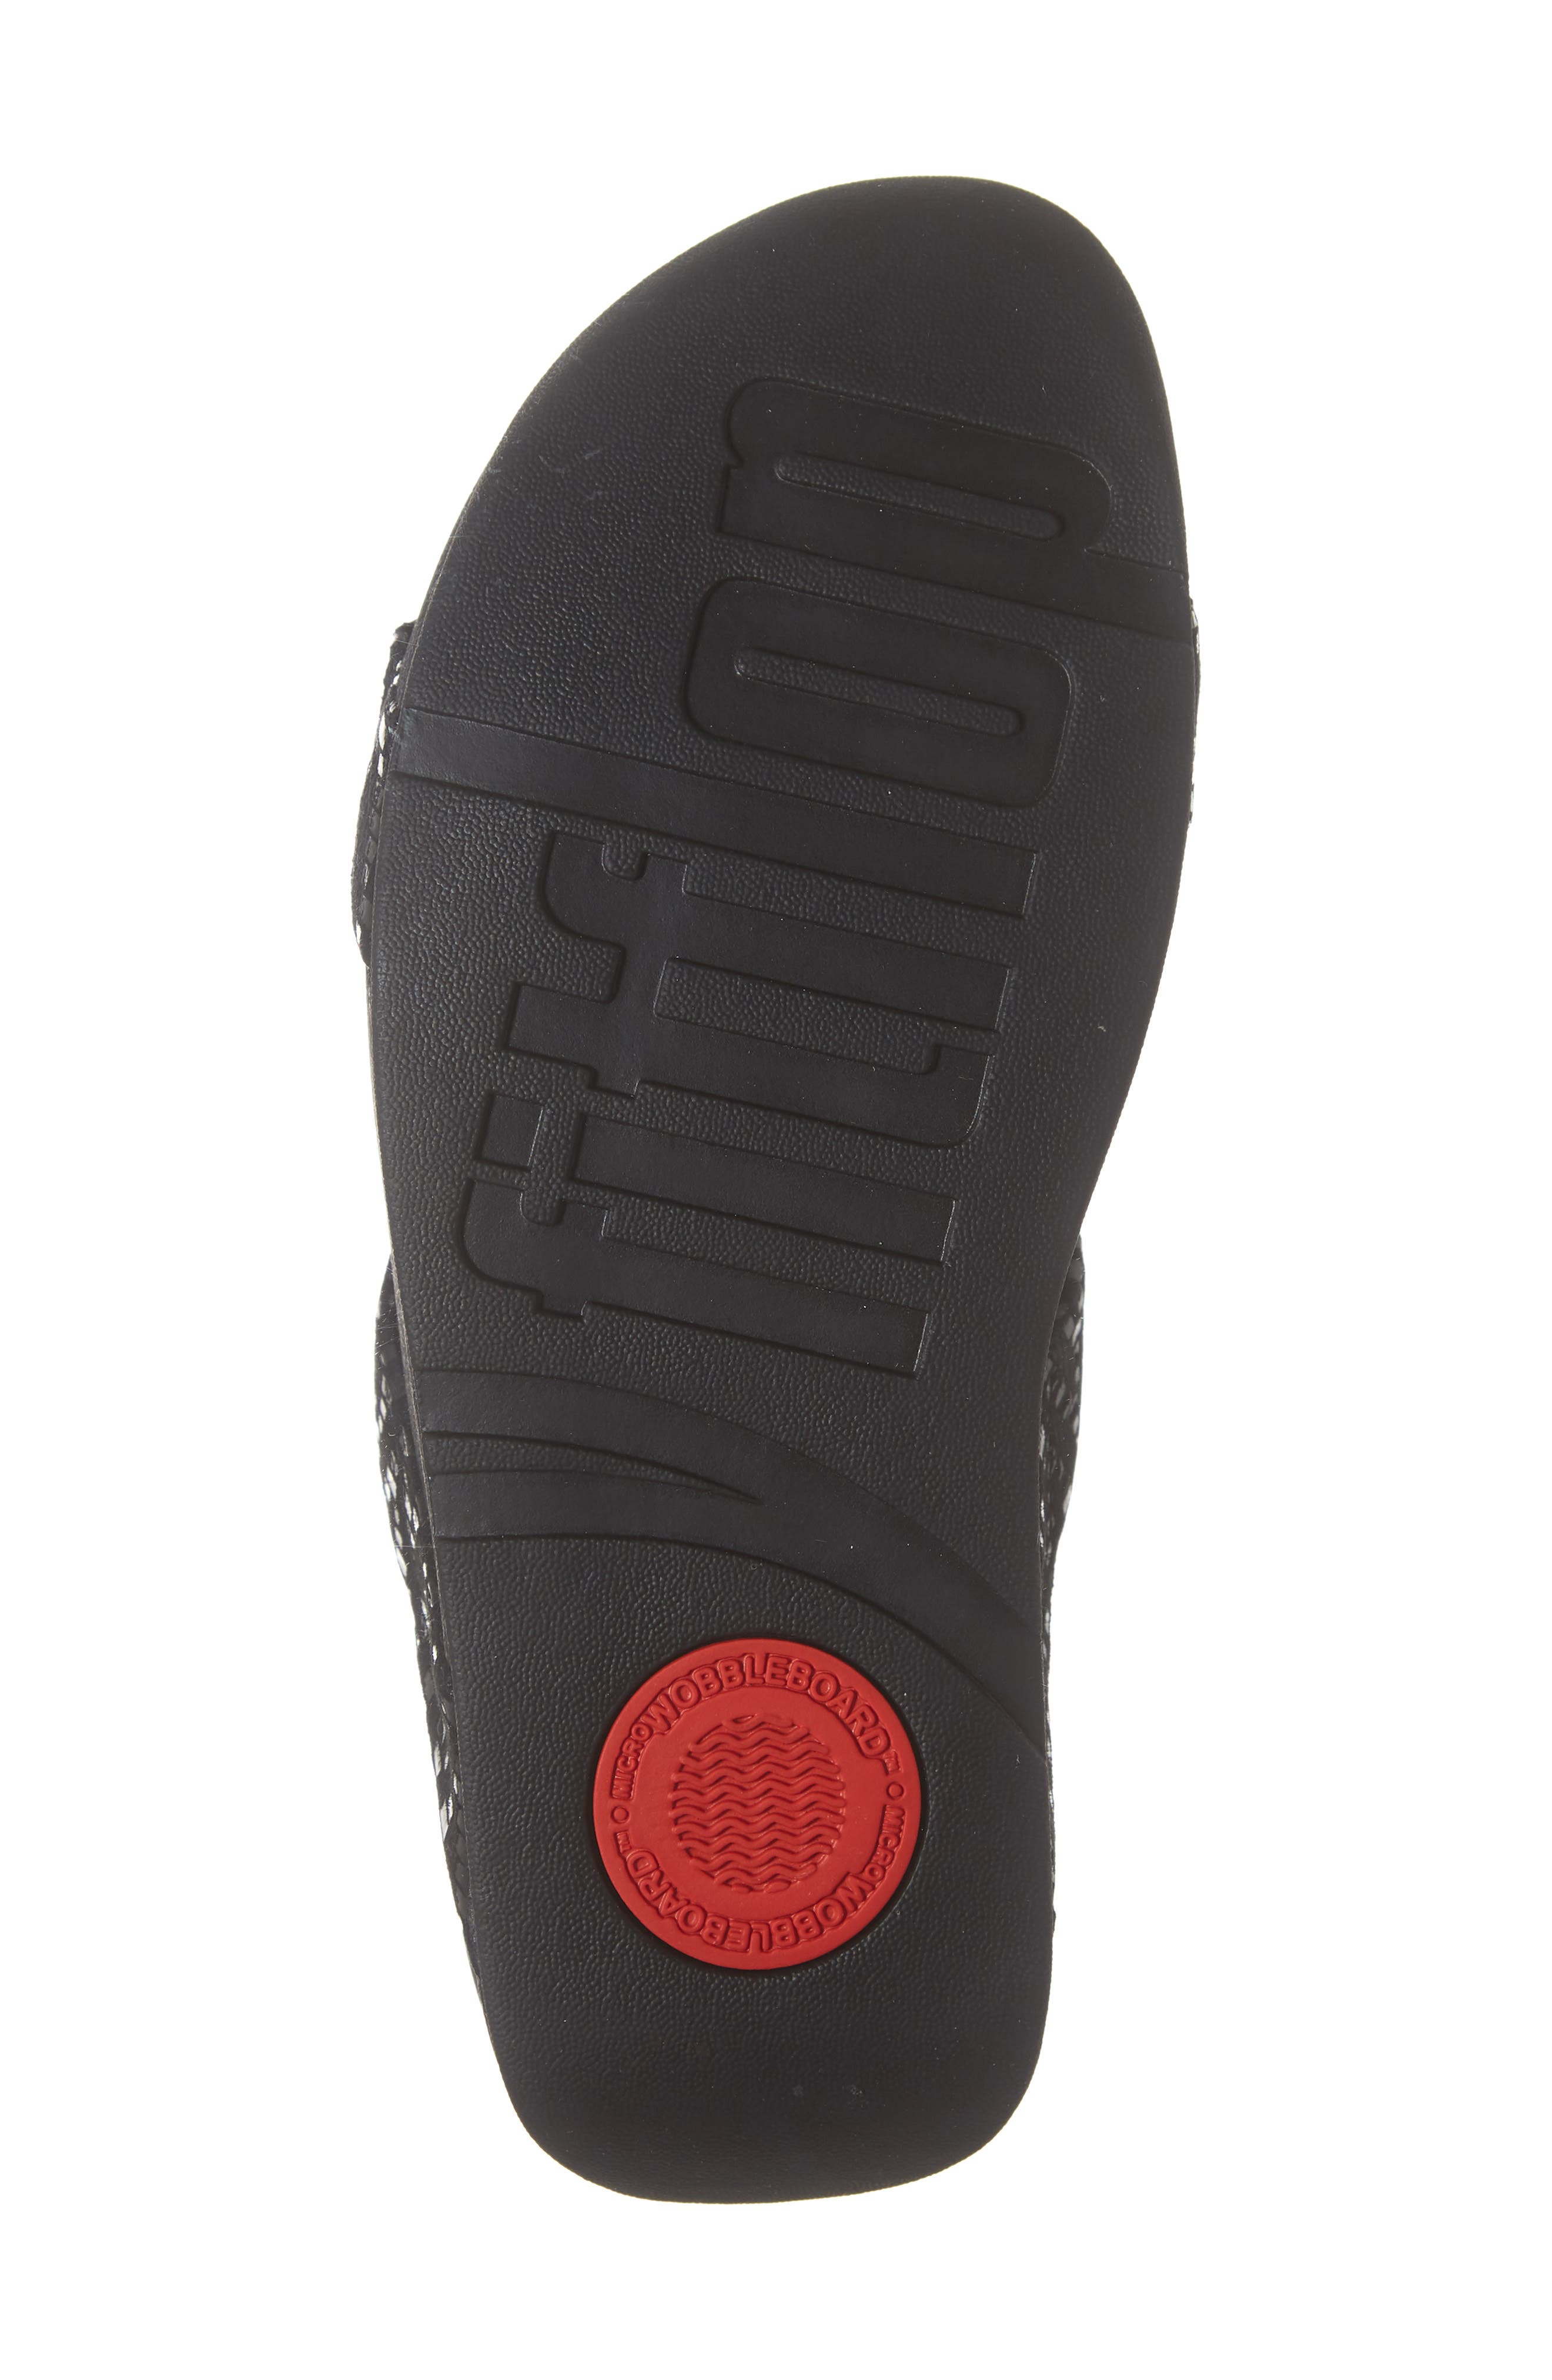 FITFLOP, Lottie Chevron Wedge Slide Sandal, Alternate thumbnail 6, color, BLACK FABRIC